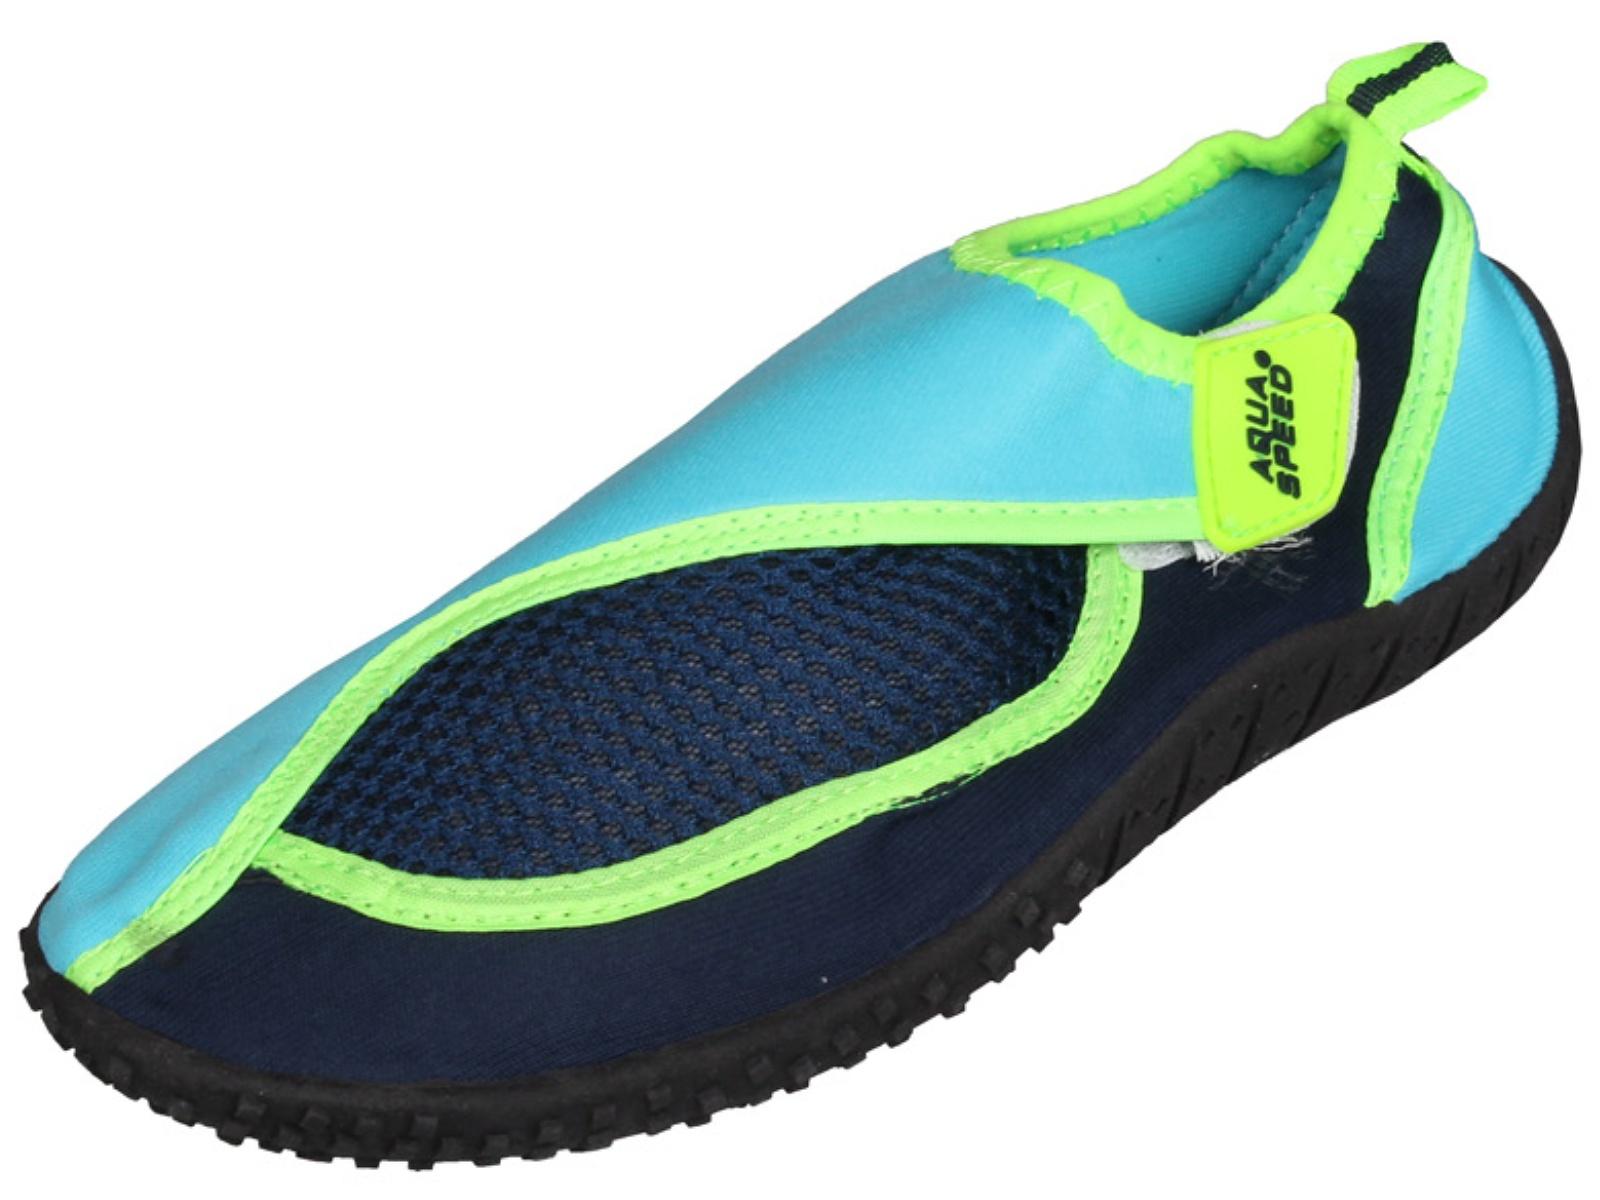 6ff5b18261 Topánky do vody AQUA-SPEED 26B detské modré - veľ. 23